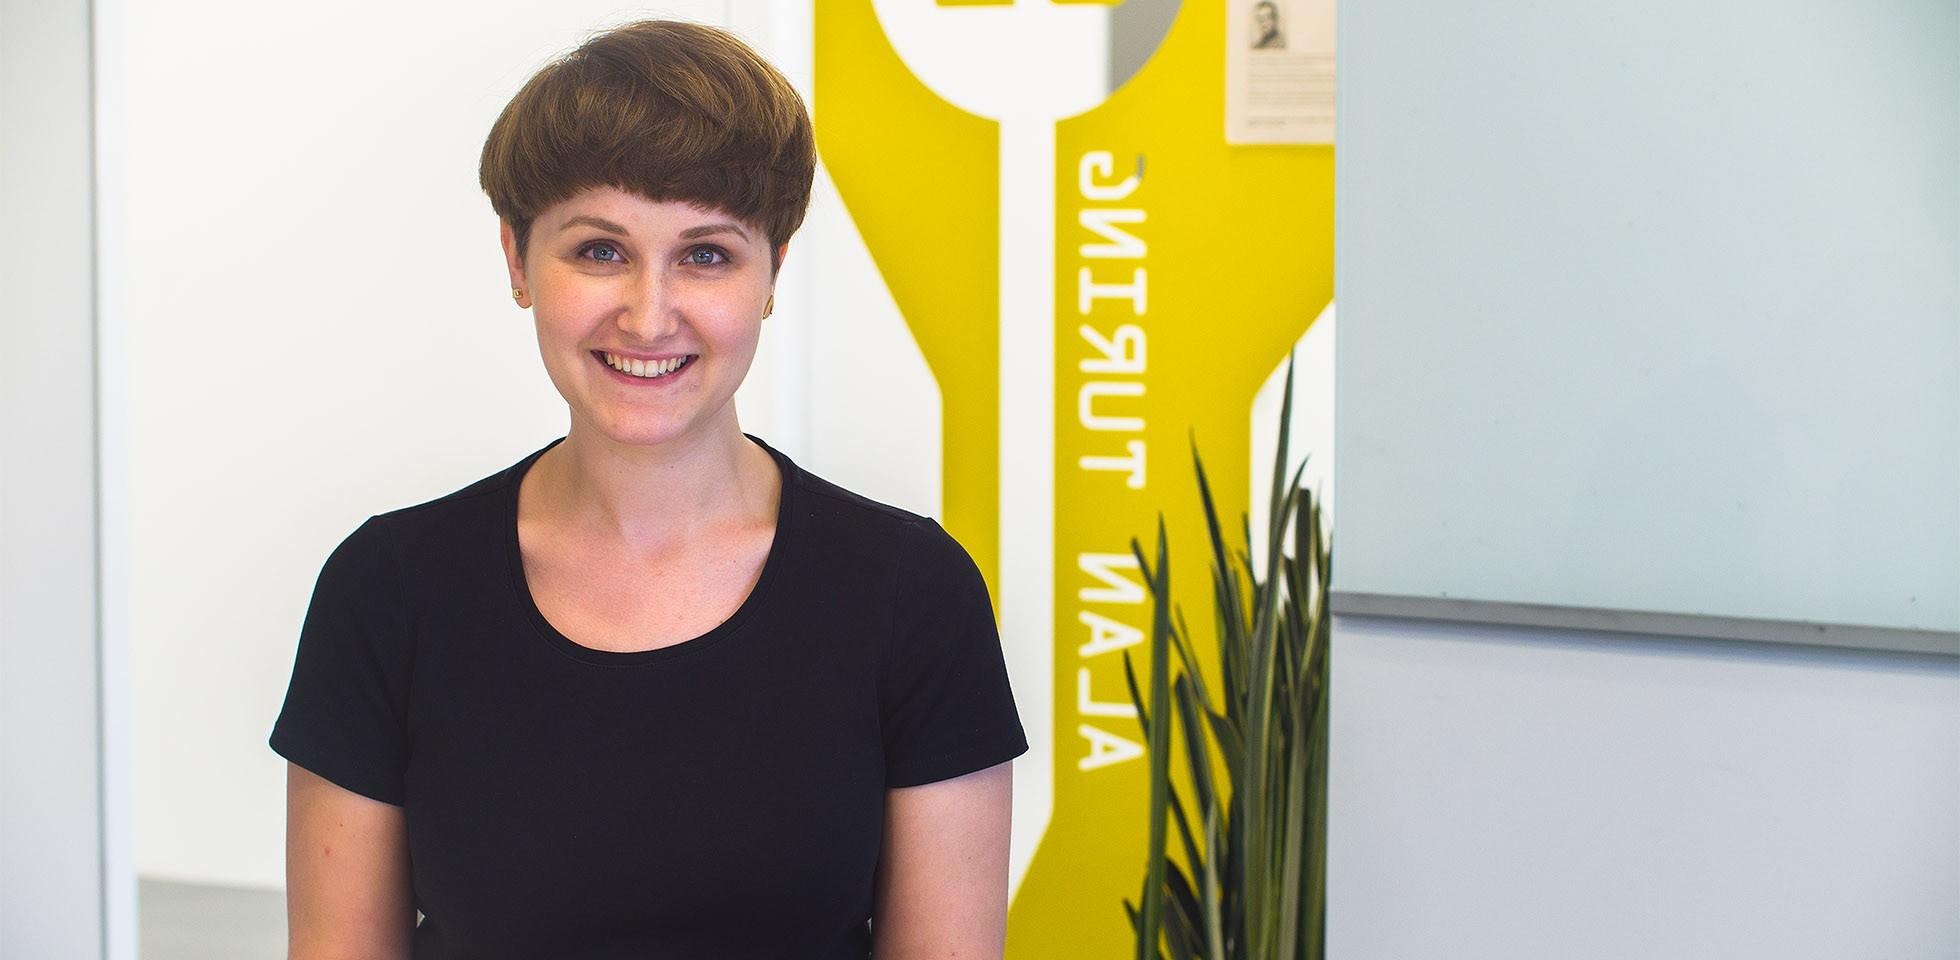 Michelle Guarino, Product Designer - Axon Careers